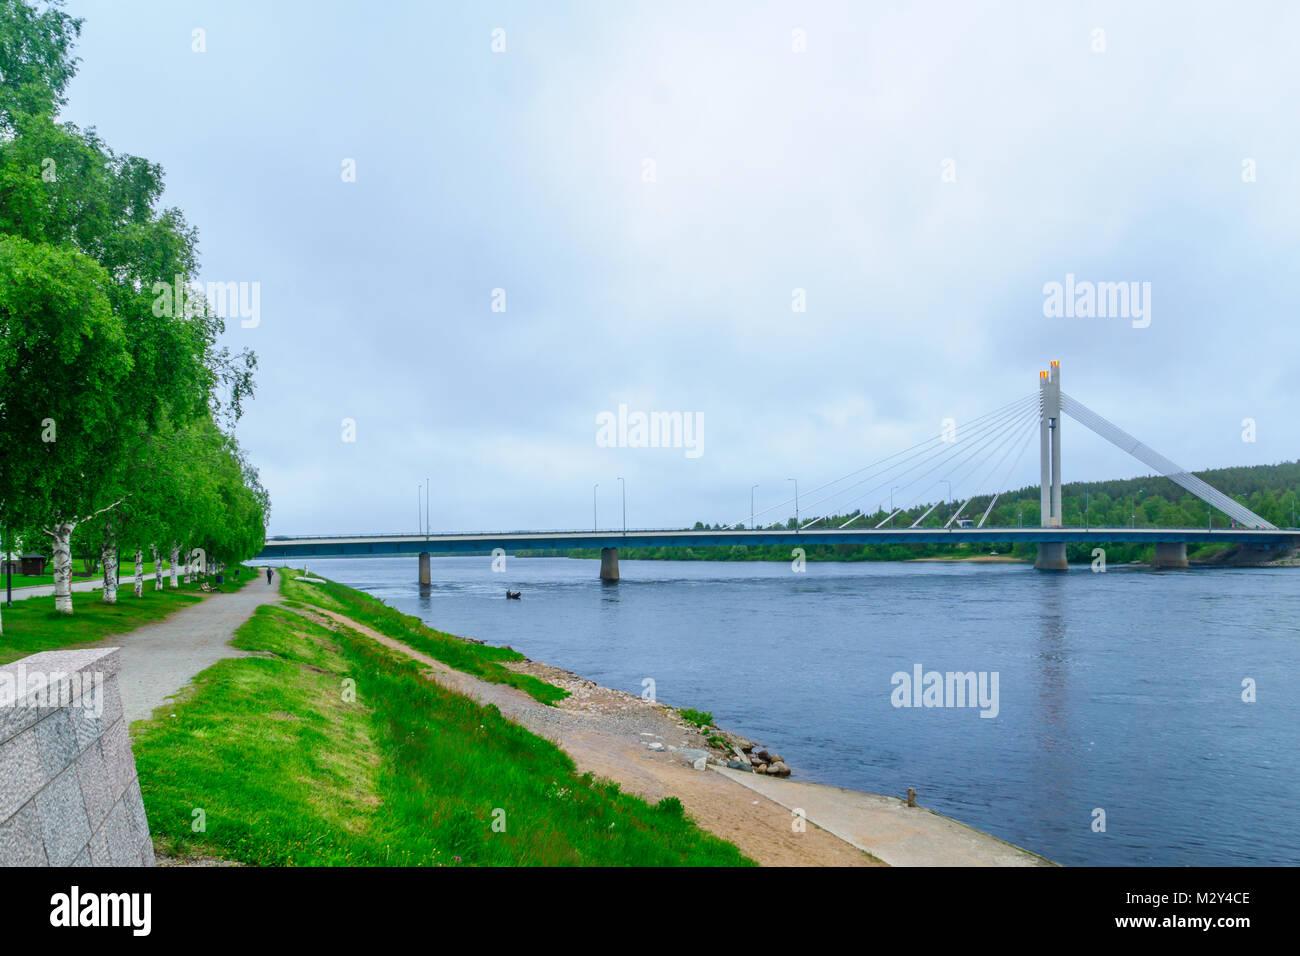 View of the Lumberjacks Candle Bridge and the Kemijoki River in Rovaniemi, Lapland, Finland Stock Photo